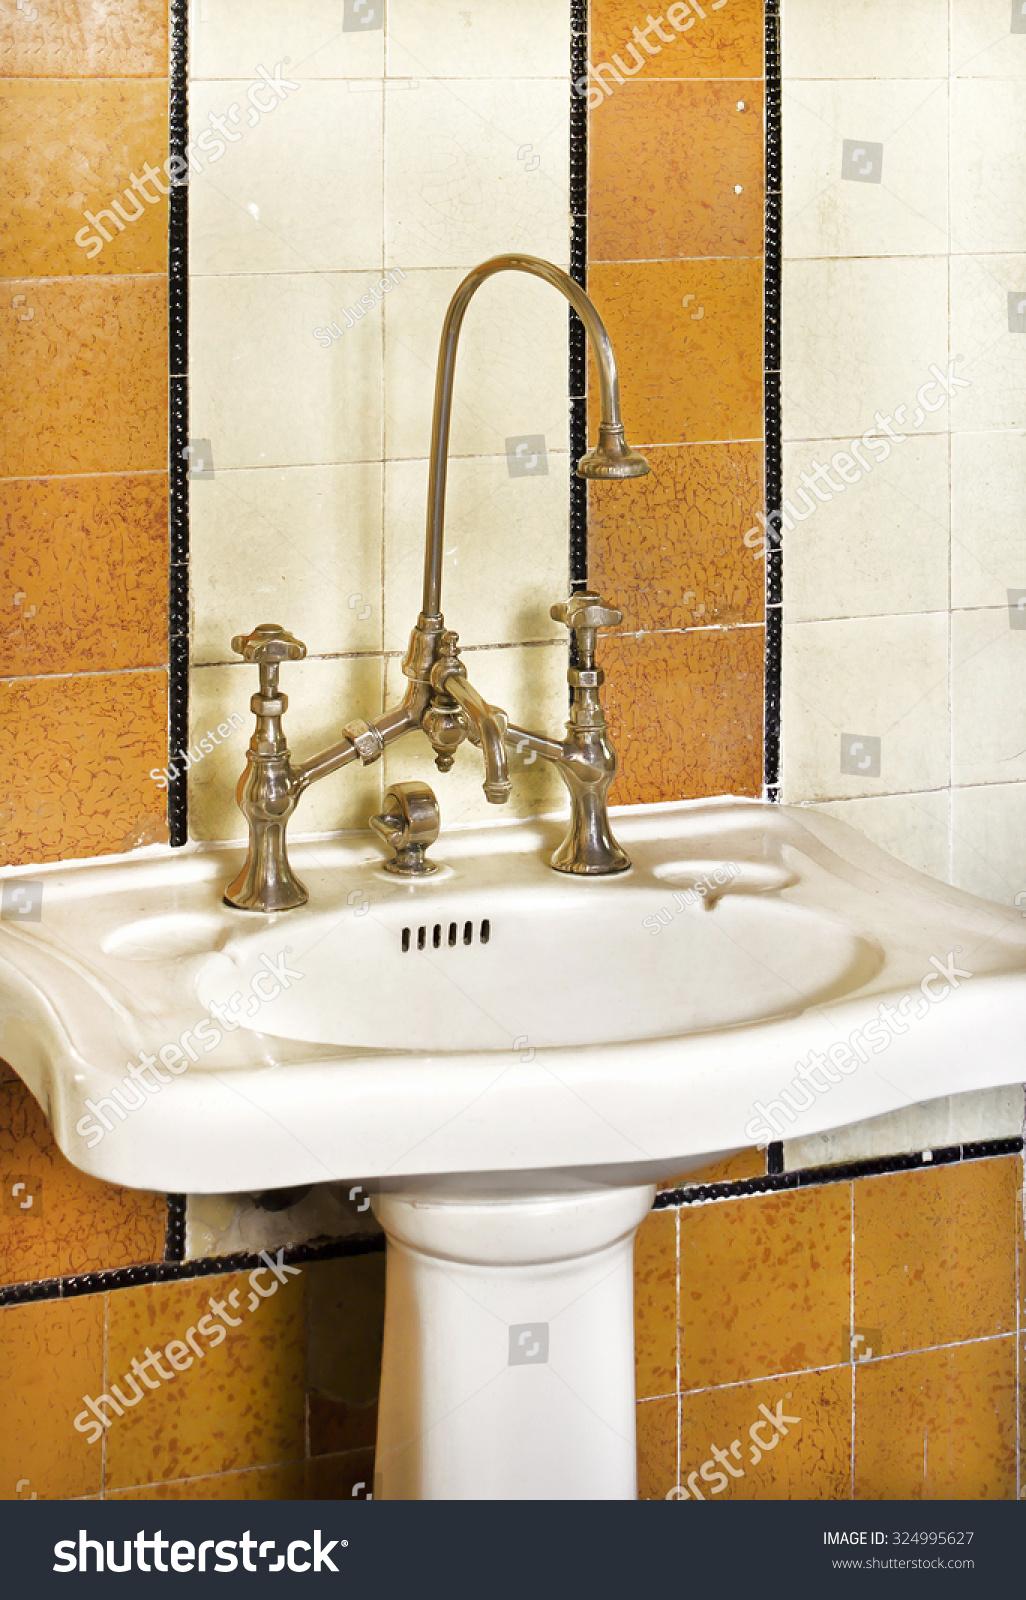 Sink Hygiene Old Taps Vintage Stock Photo 324995627 - Shutterstock